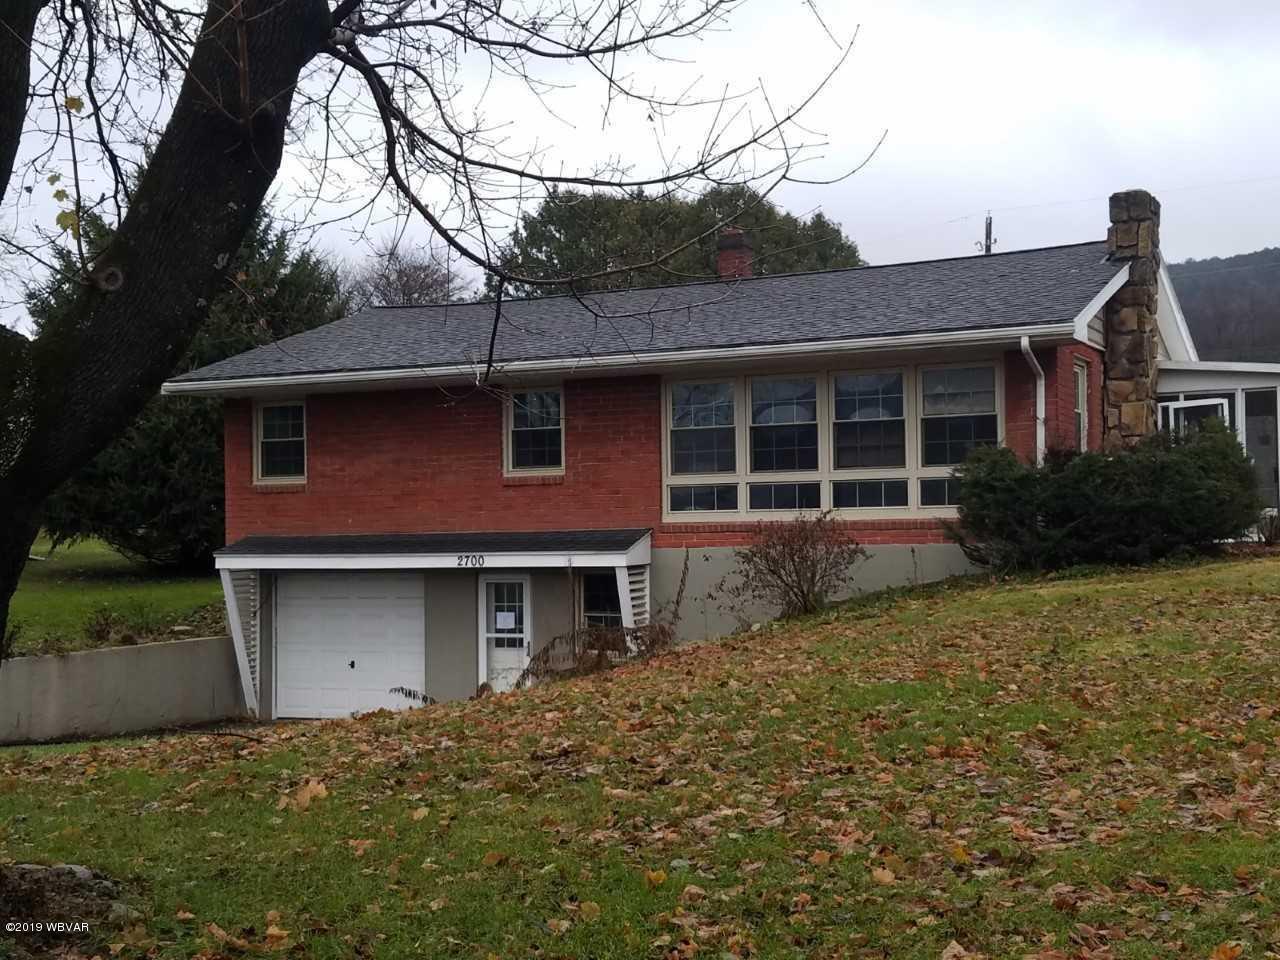 2700 MCCOY STREET,Williamsport,PA 17701,3 Bedrooms Bedrooms,1 BathroomBathrooms,Residential,MCCOY,WB-86596